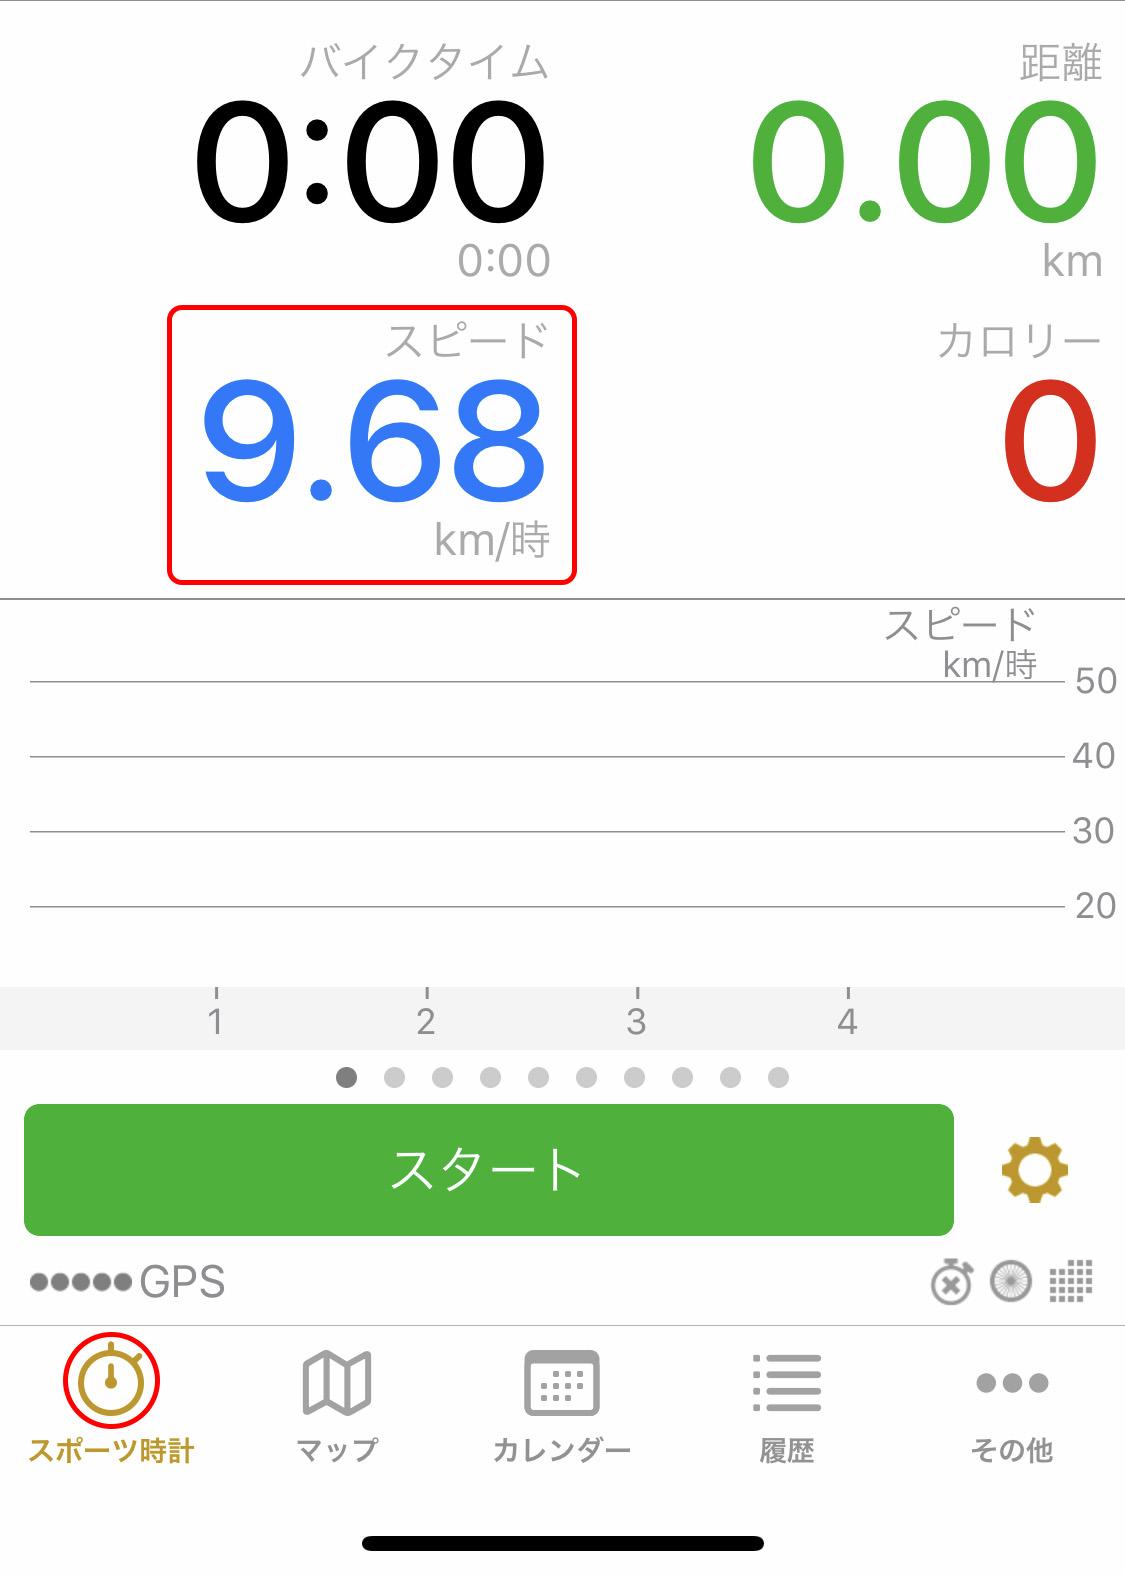 CyclemeterにXOSSセンサーを追加:センサーの動作確認